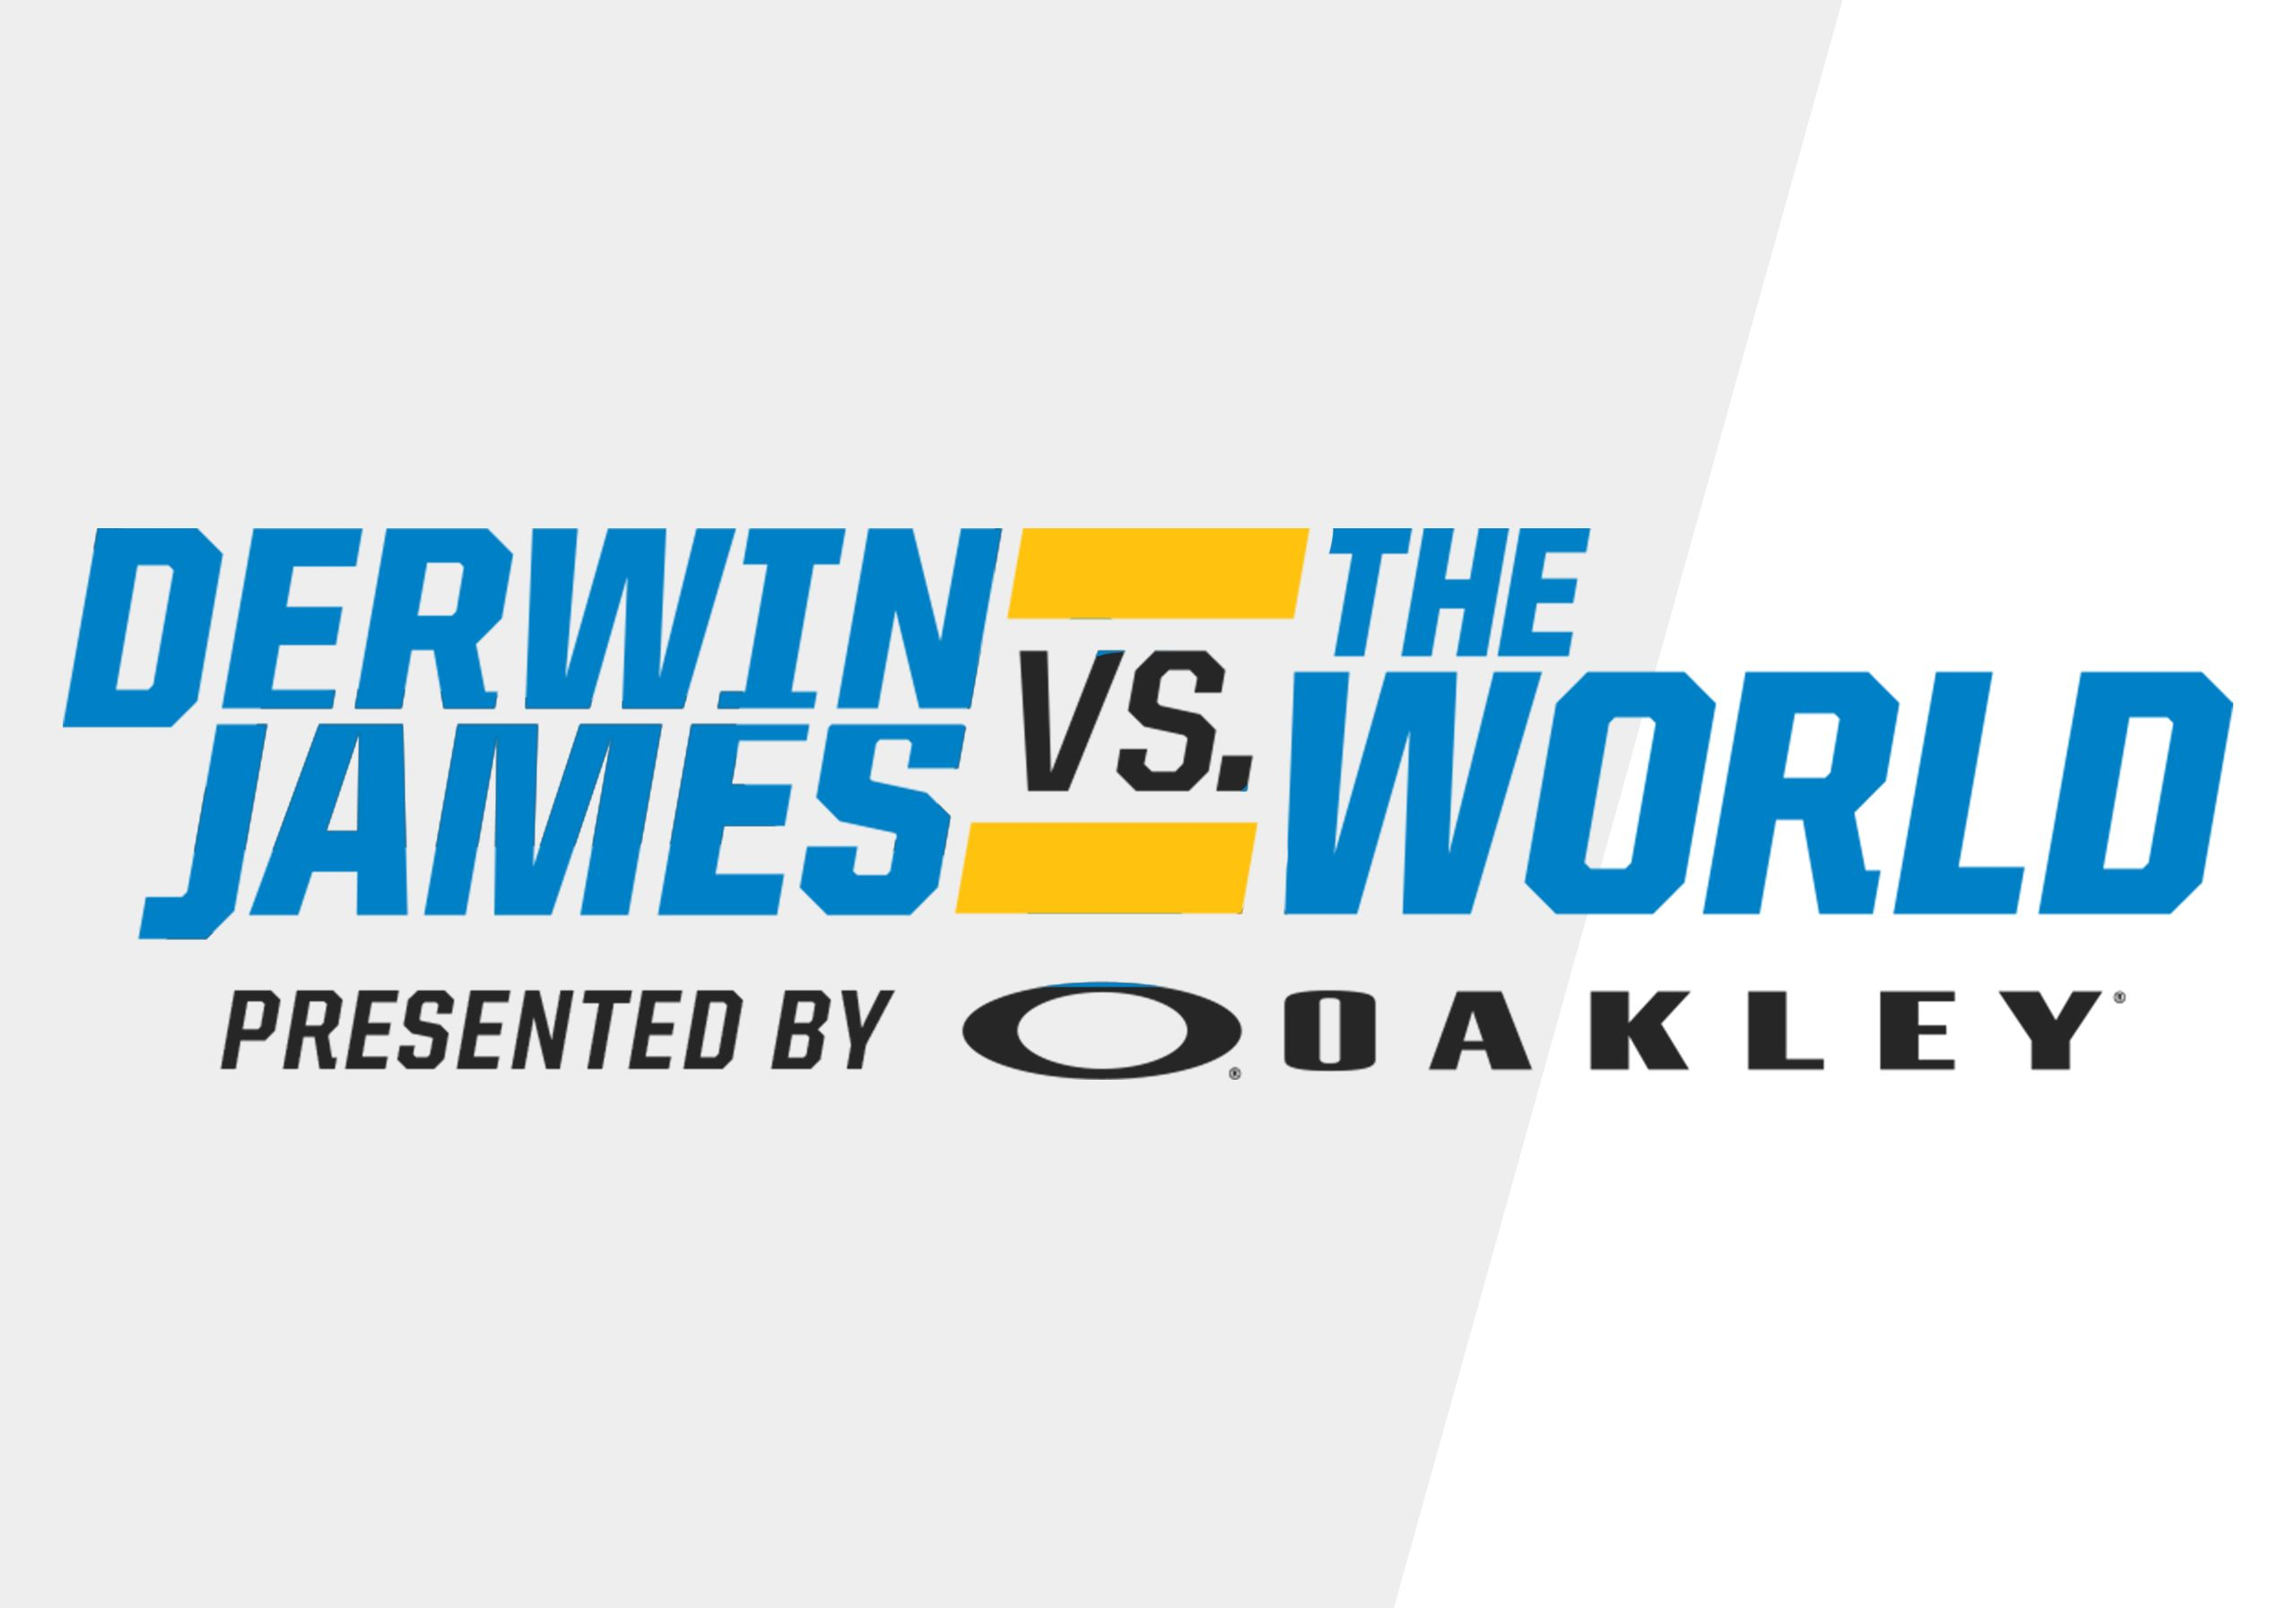 Derwin James vs. The World